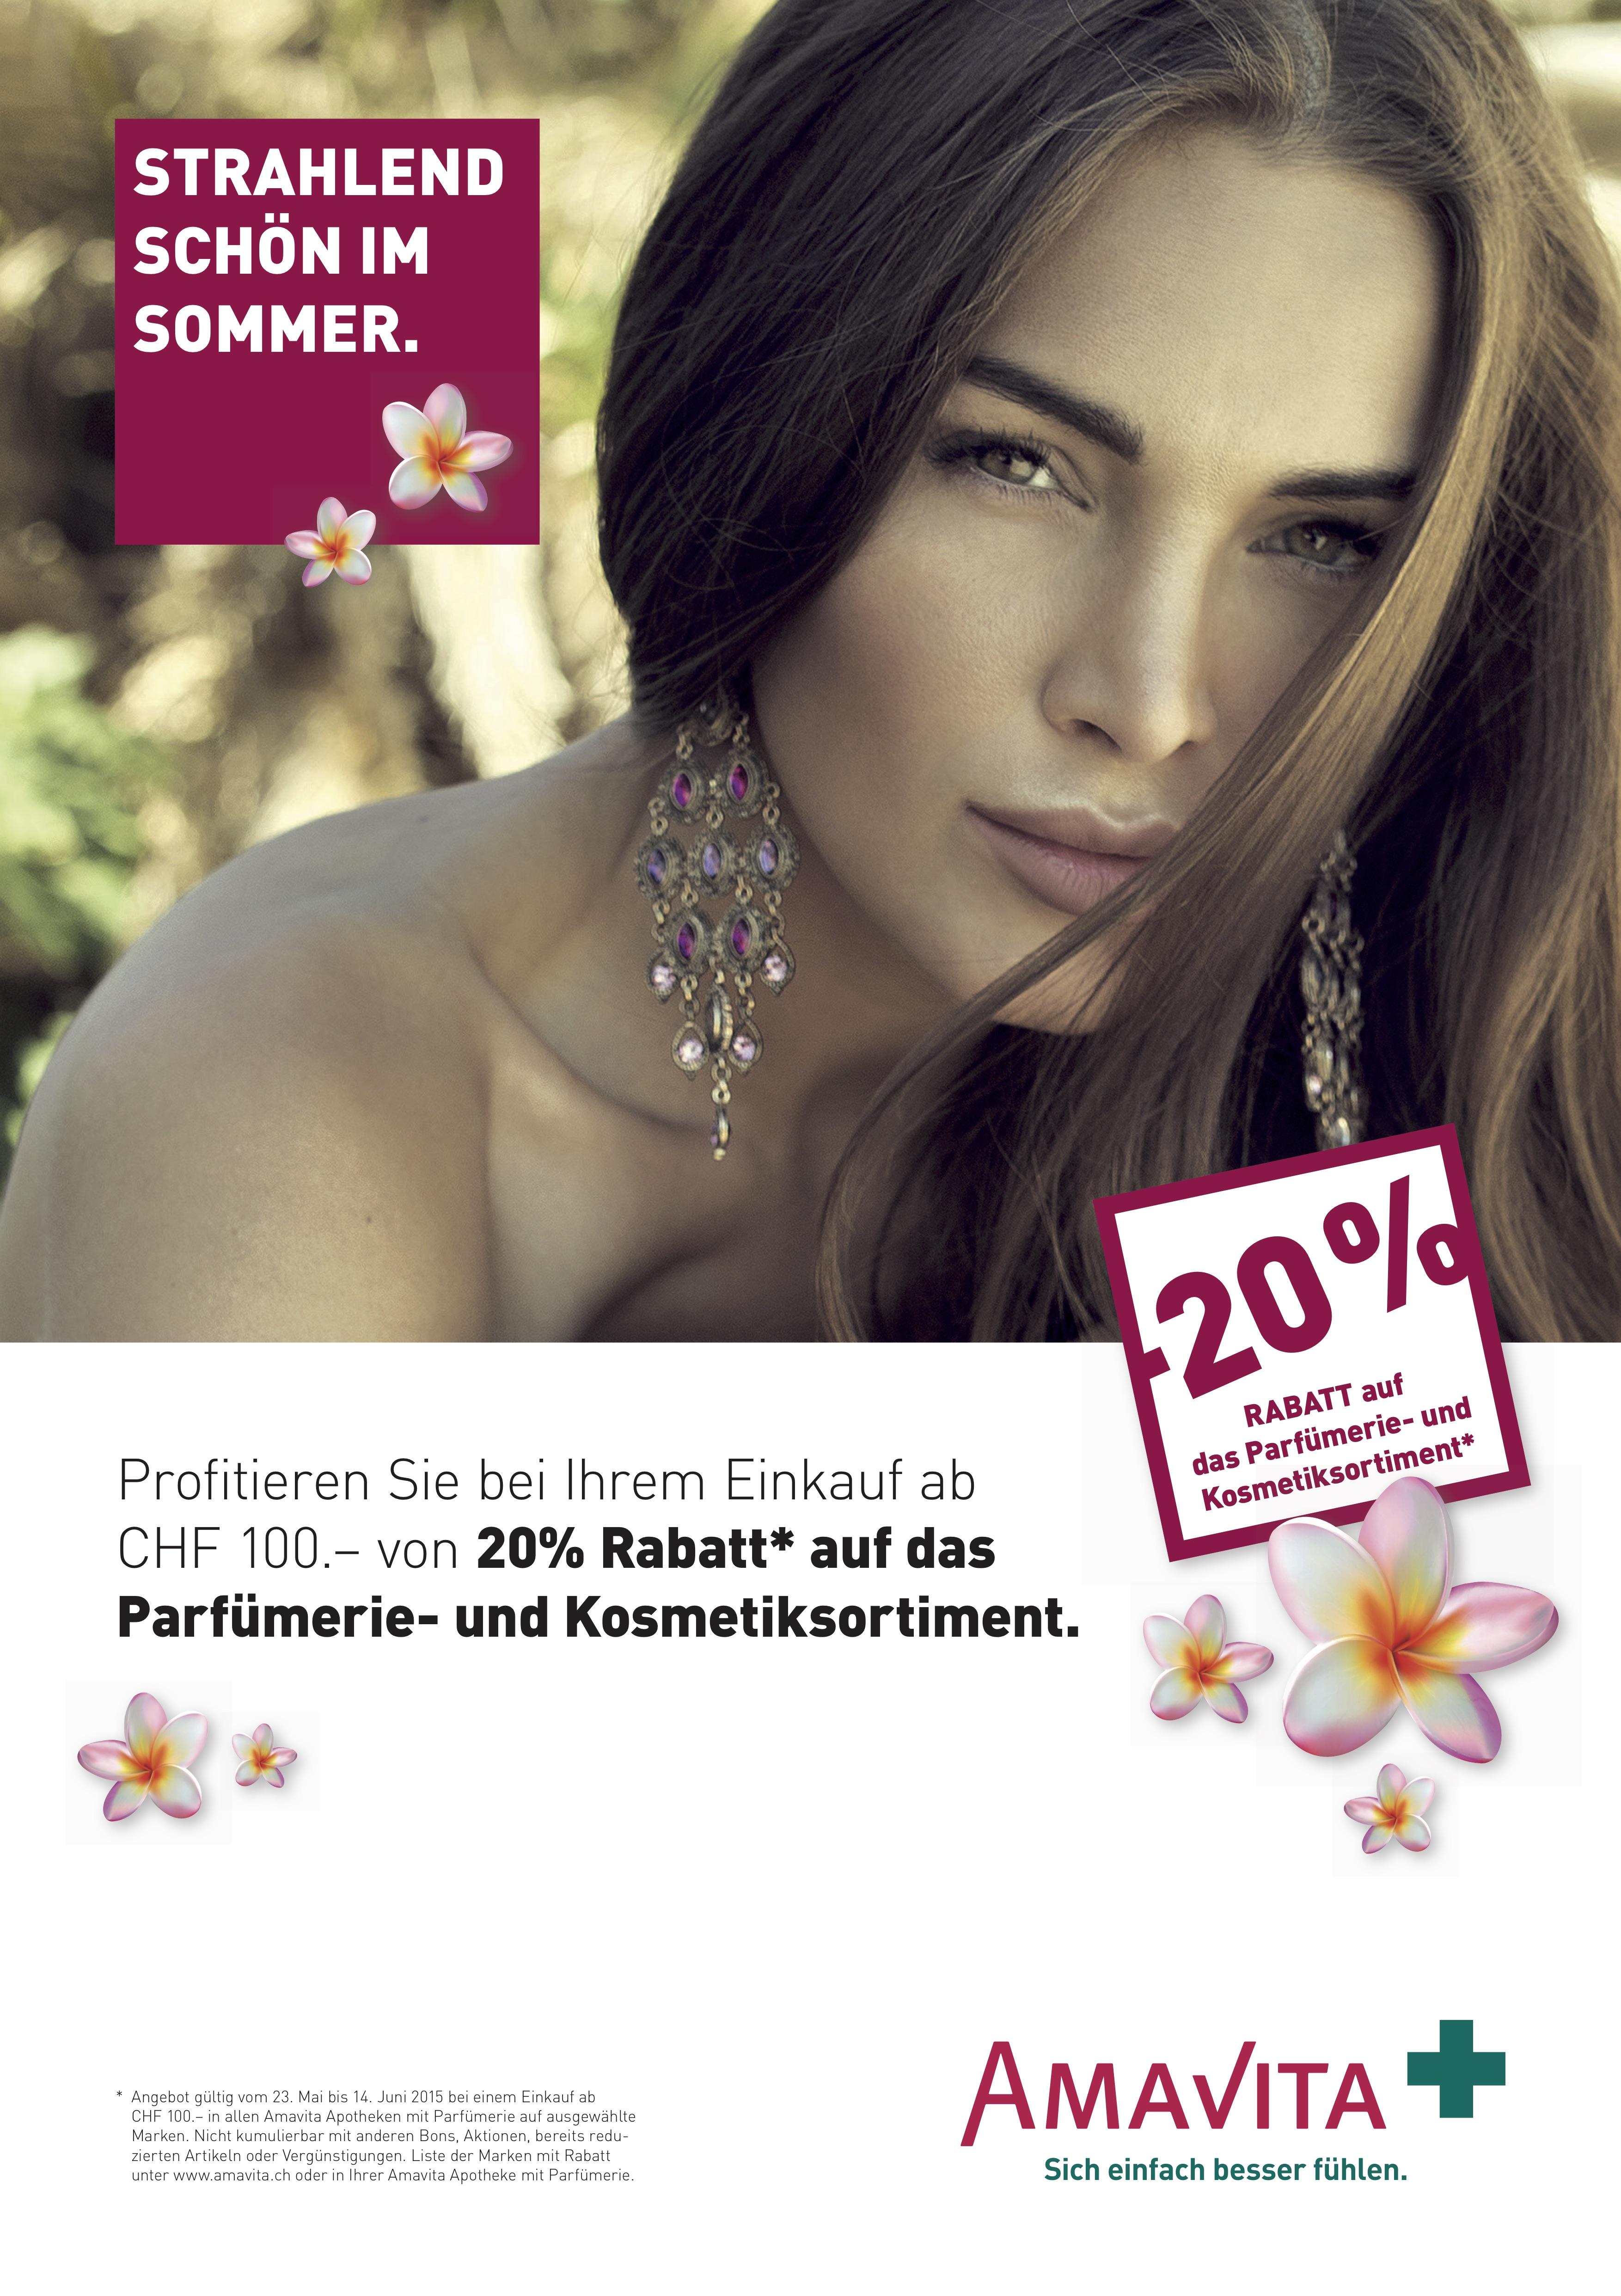 Amavita Parfümeriekampagne 2015